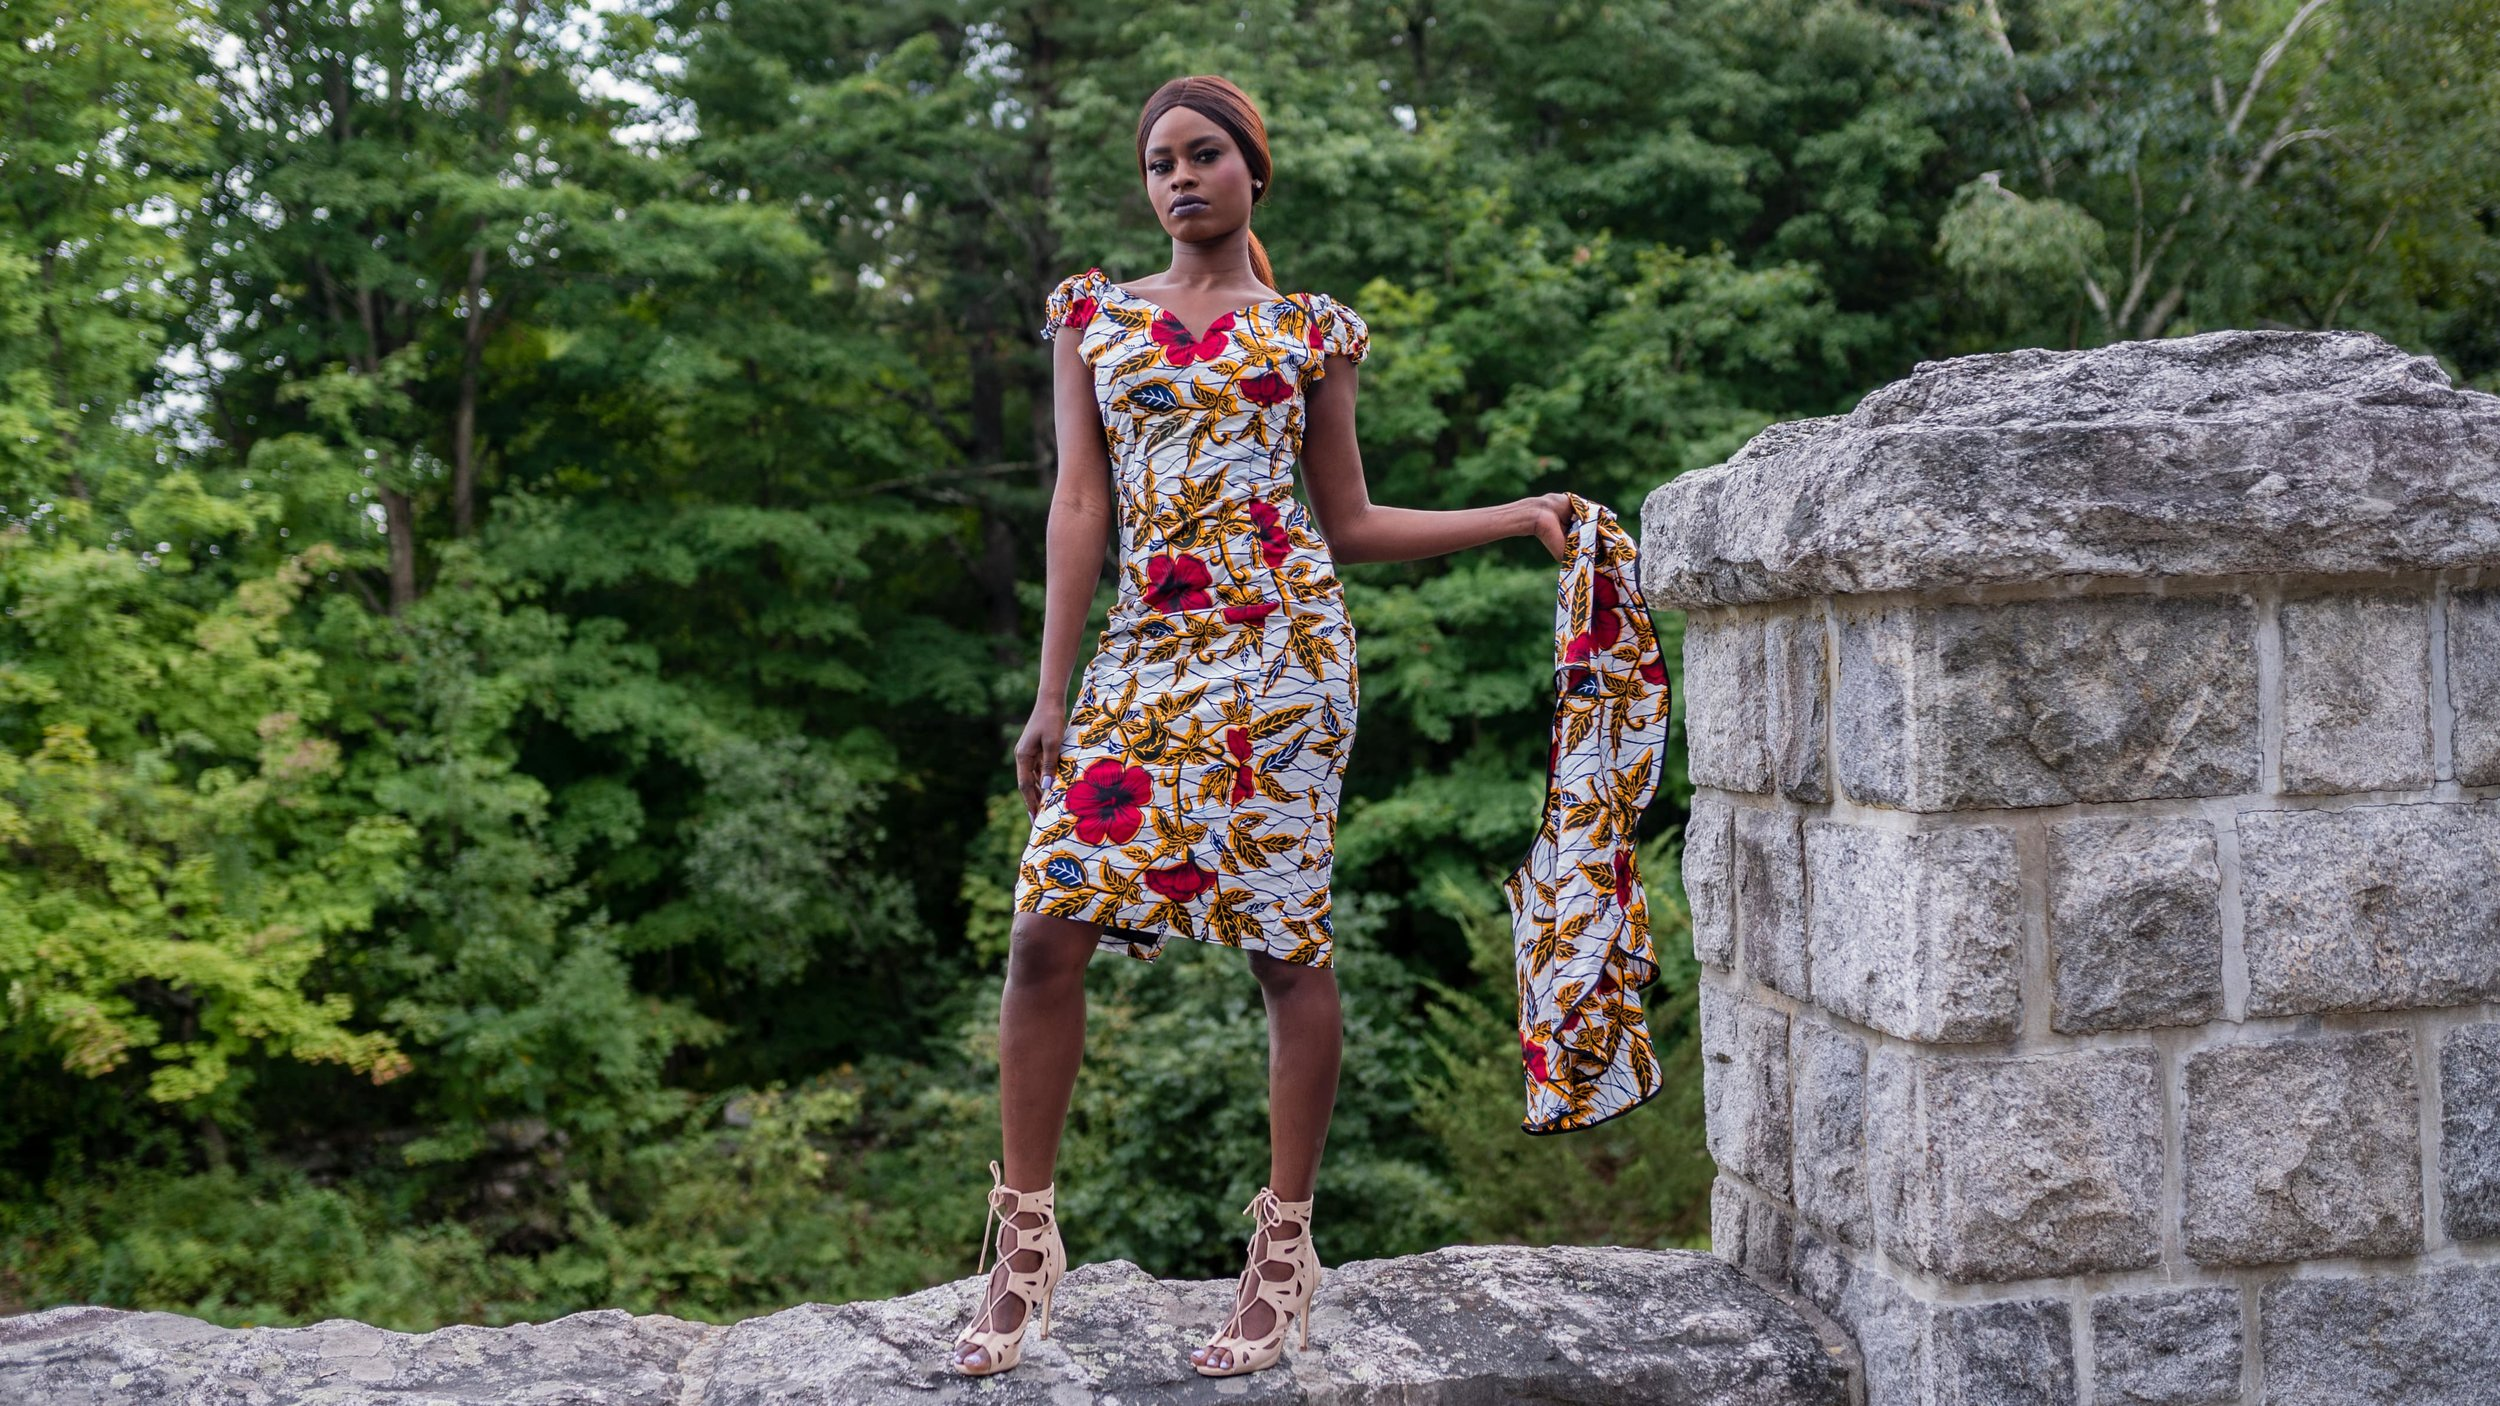 VinnyMwano_Fashion Editorial 8-min.jpg